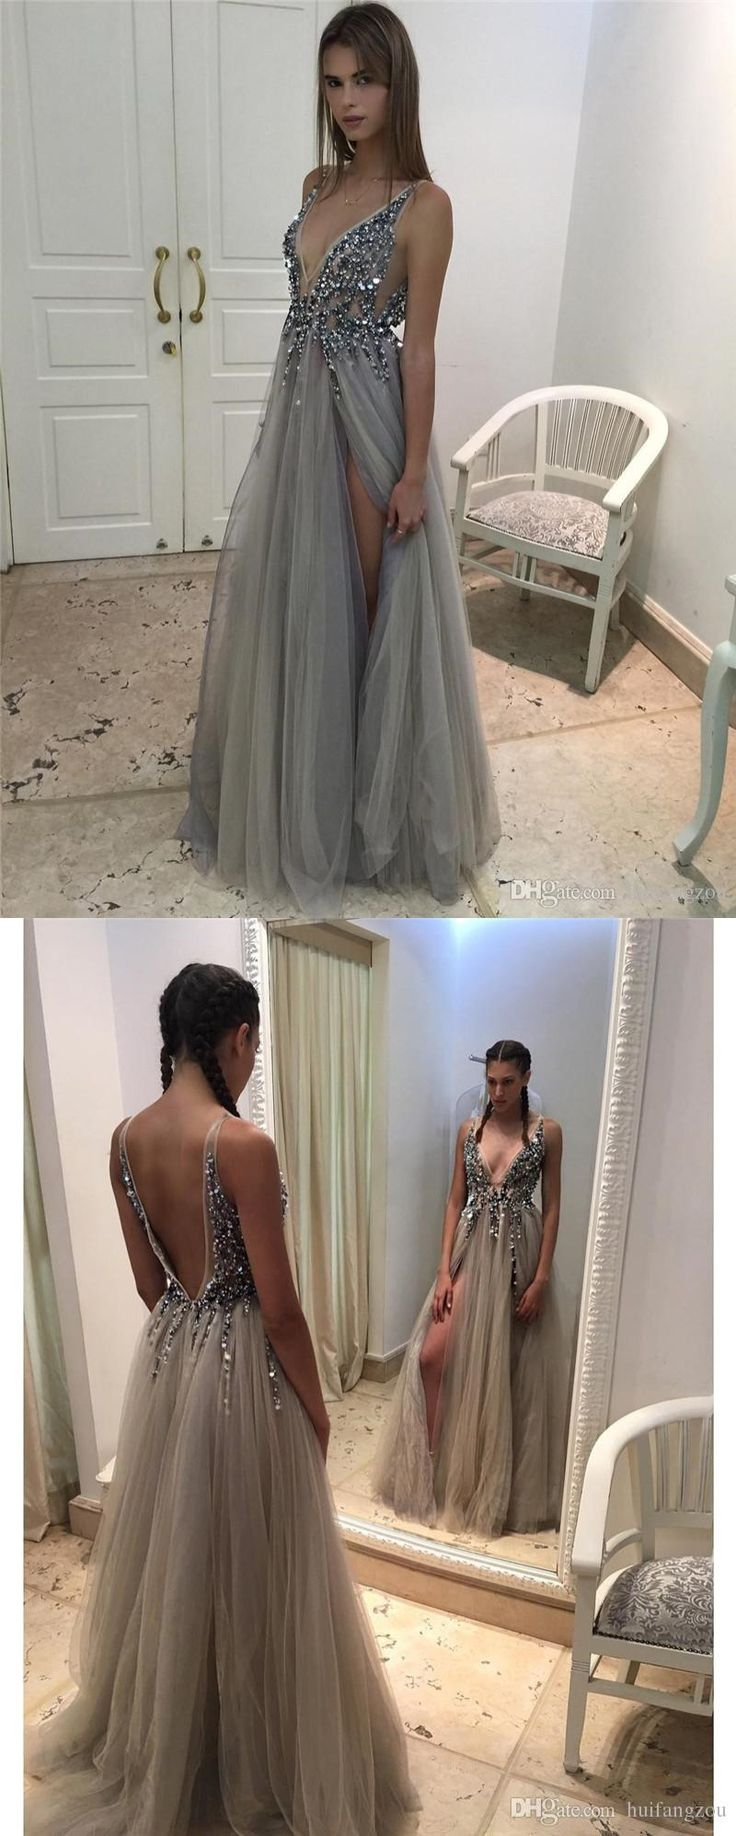 2017 prom dress, long prom dress, grey prom dress, v-neck prom dress, side slit prom dress, evening dress, luxurious beads prom dress